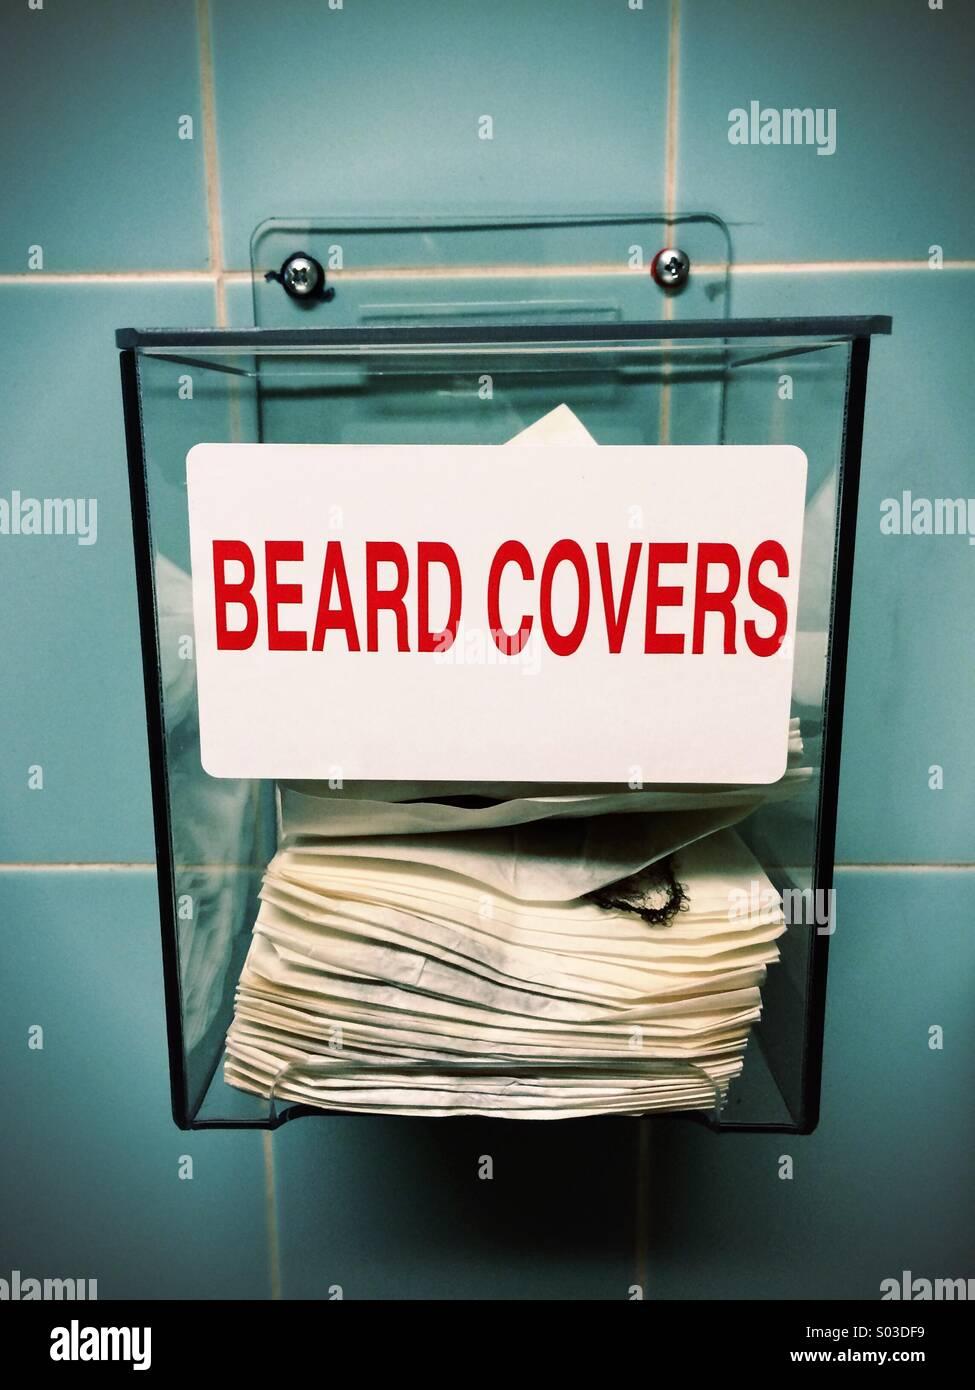 Beard covers - Stock Image